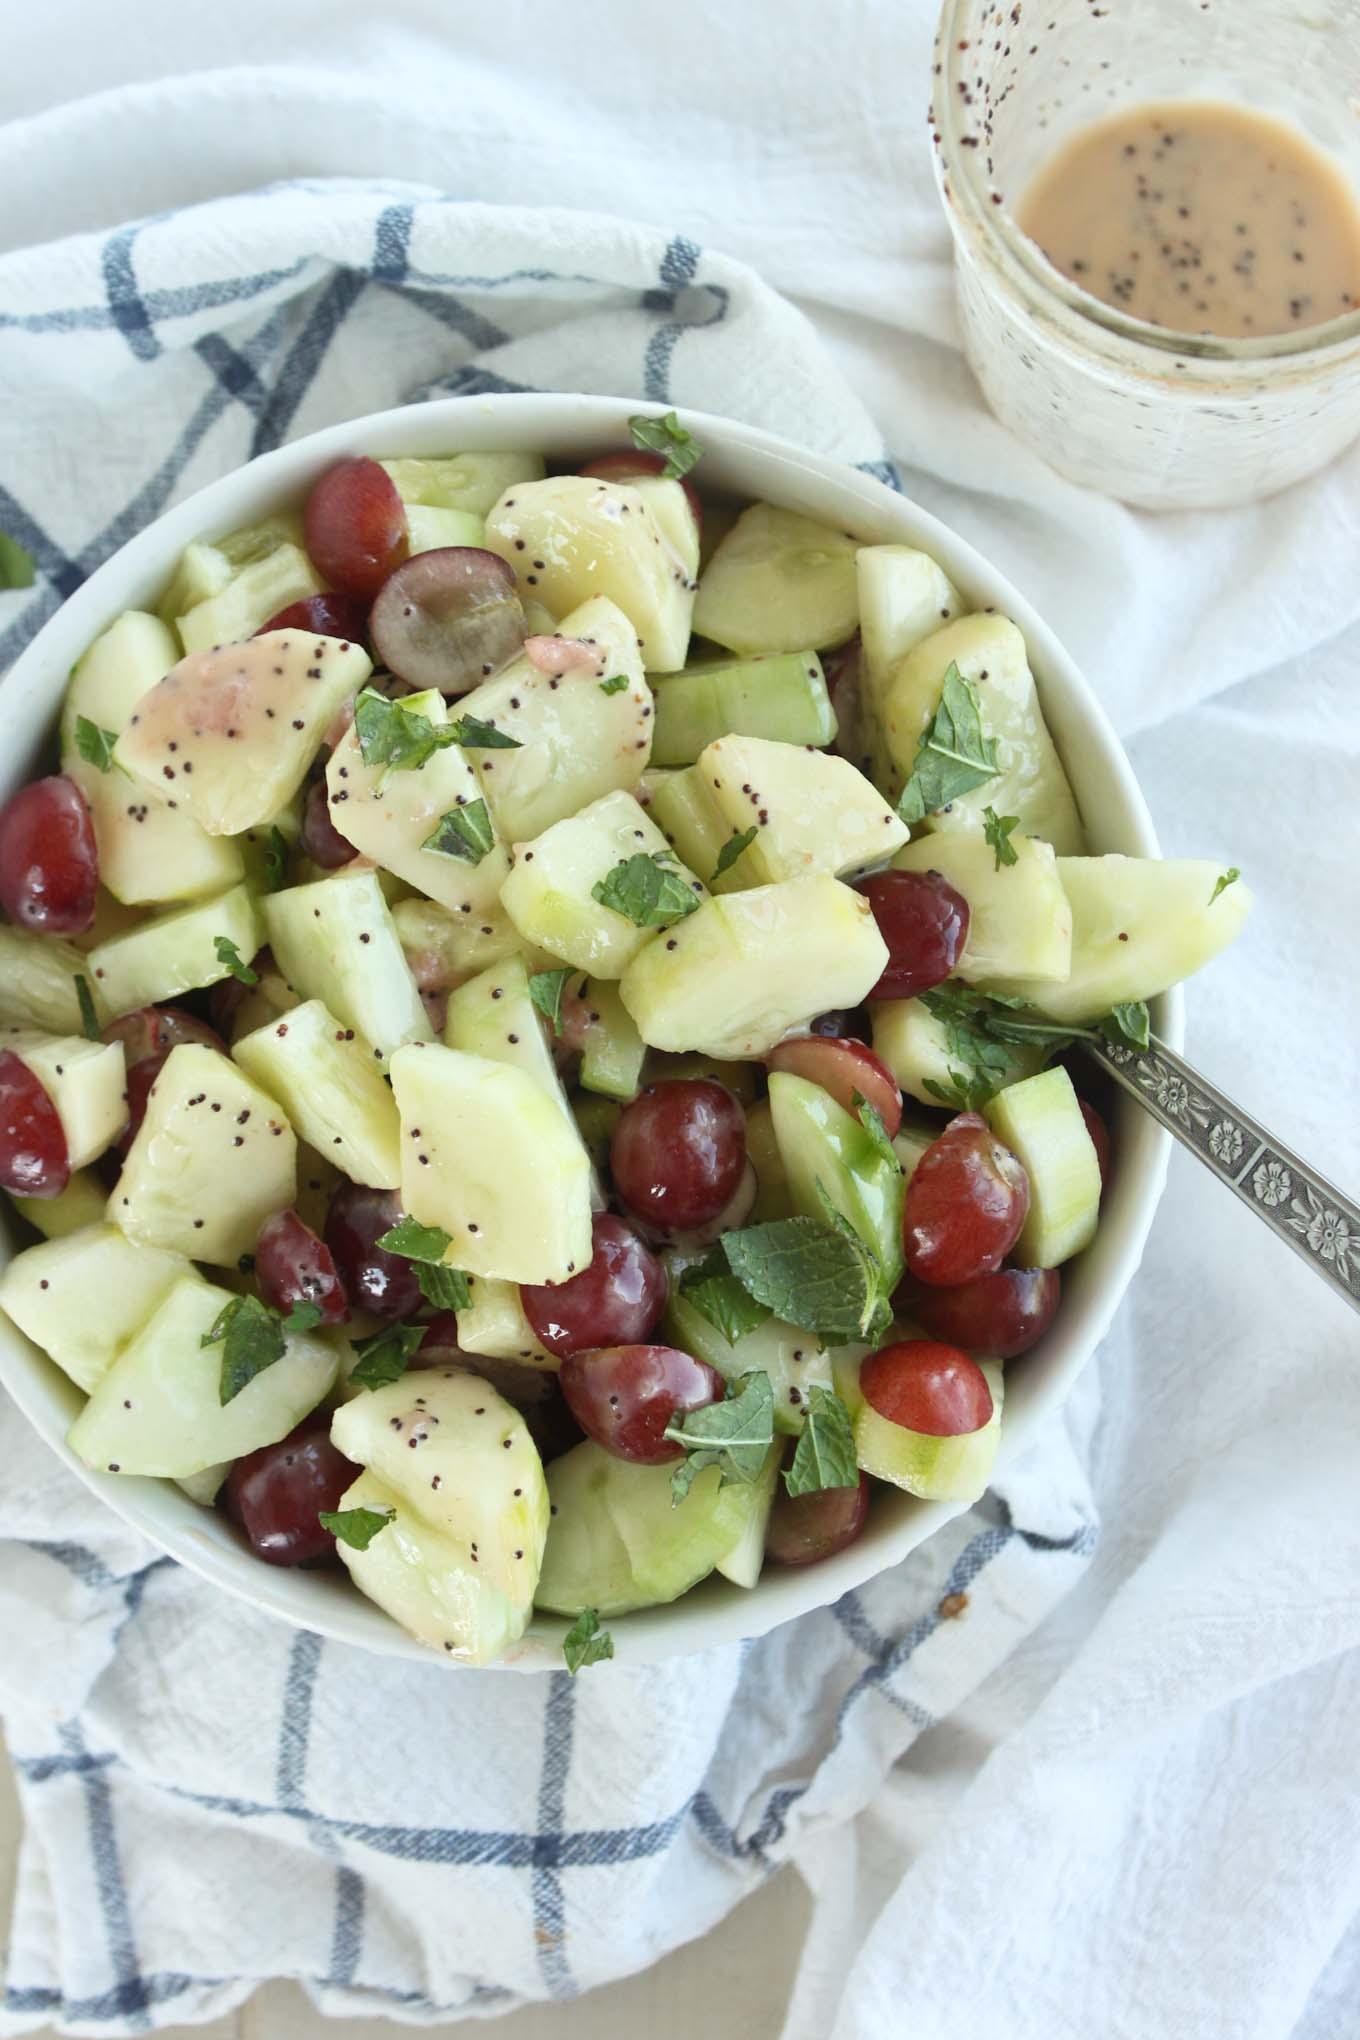 10 minute Cucumber Grape Salad with Poppyseed Dressing | simplerootswellness.com